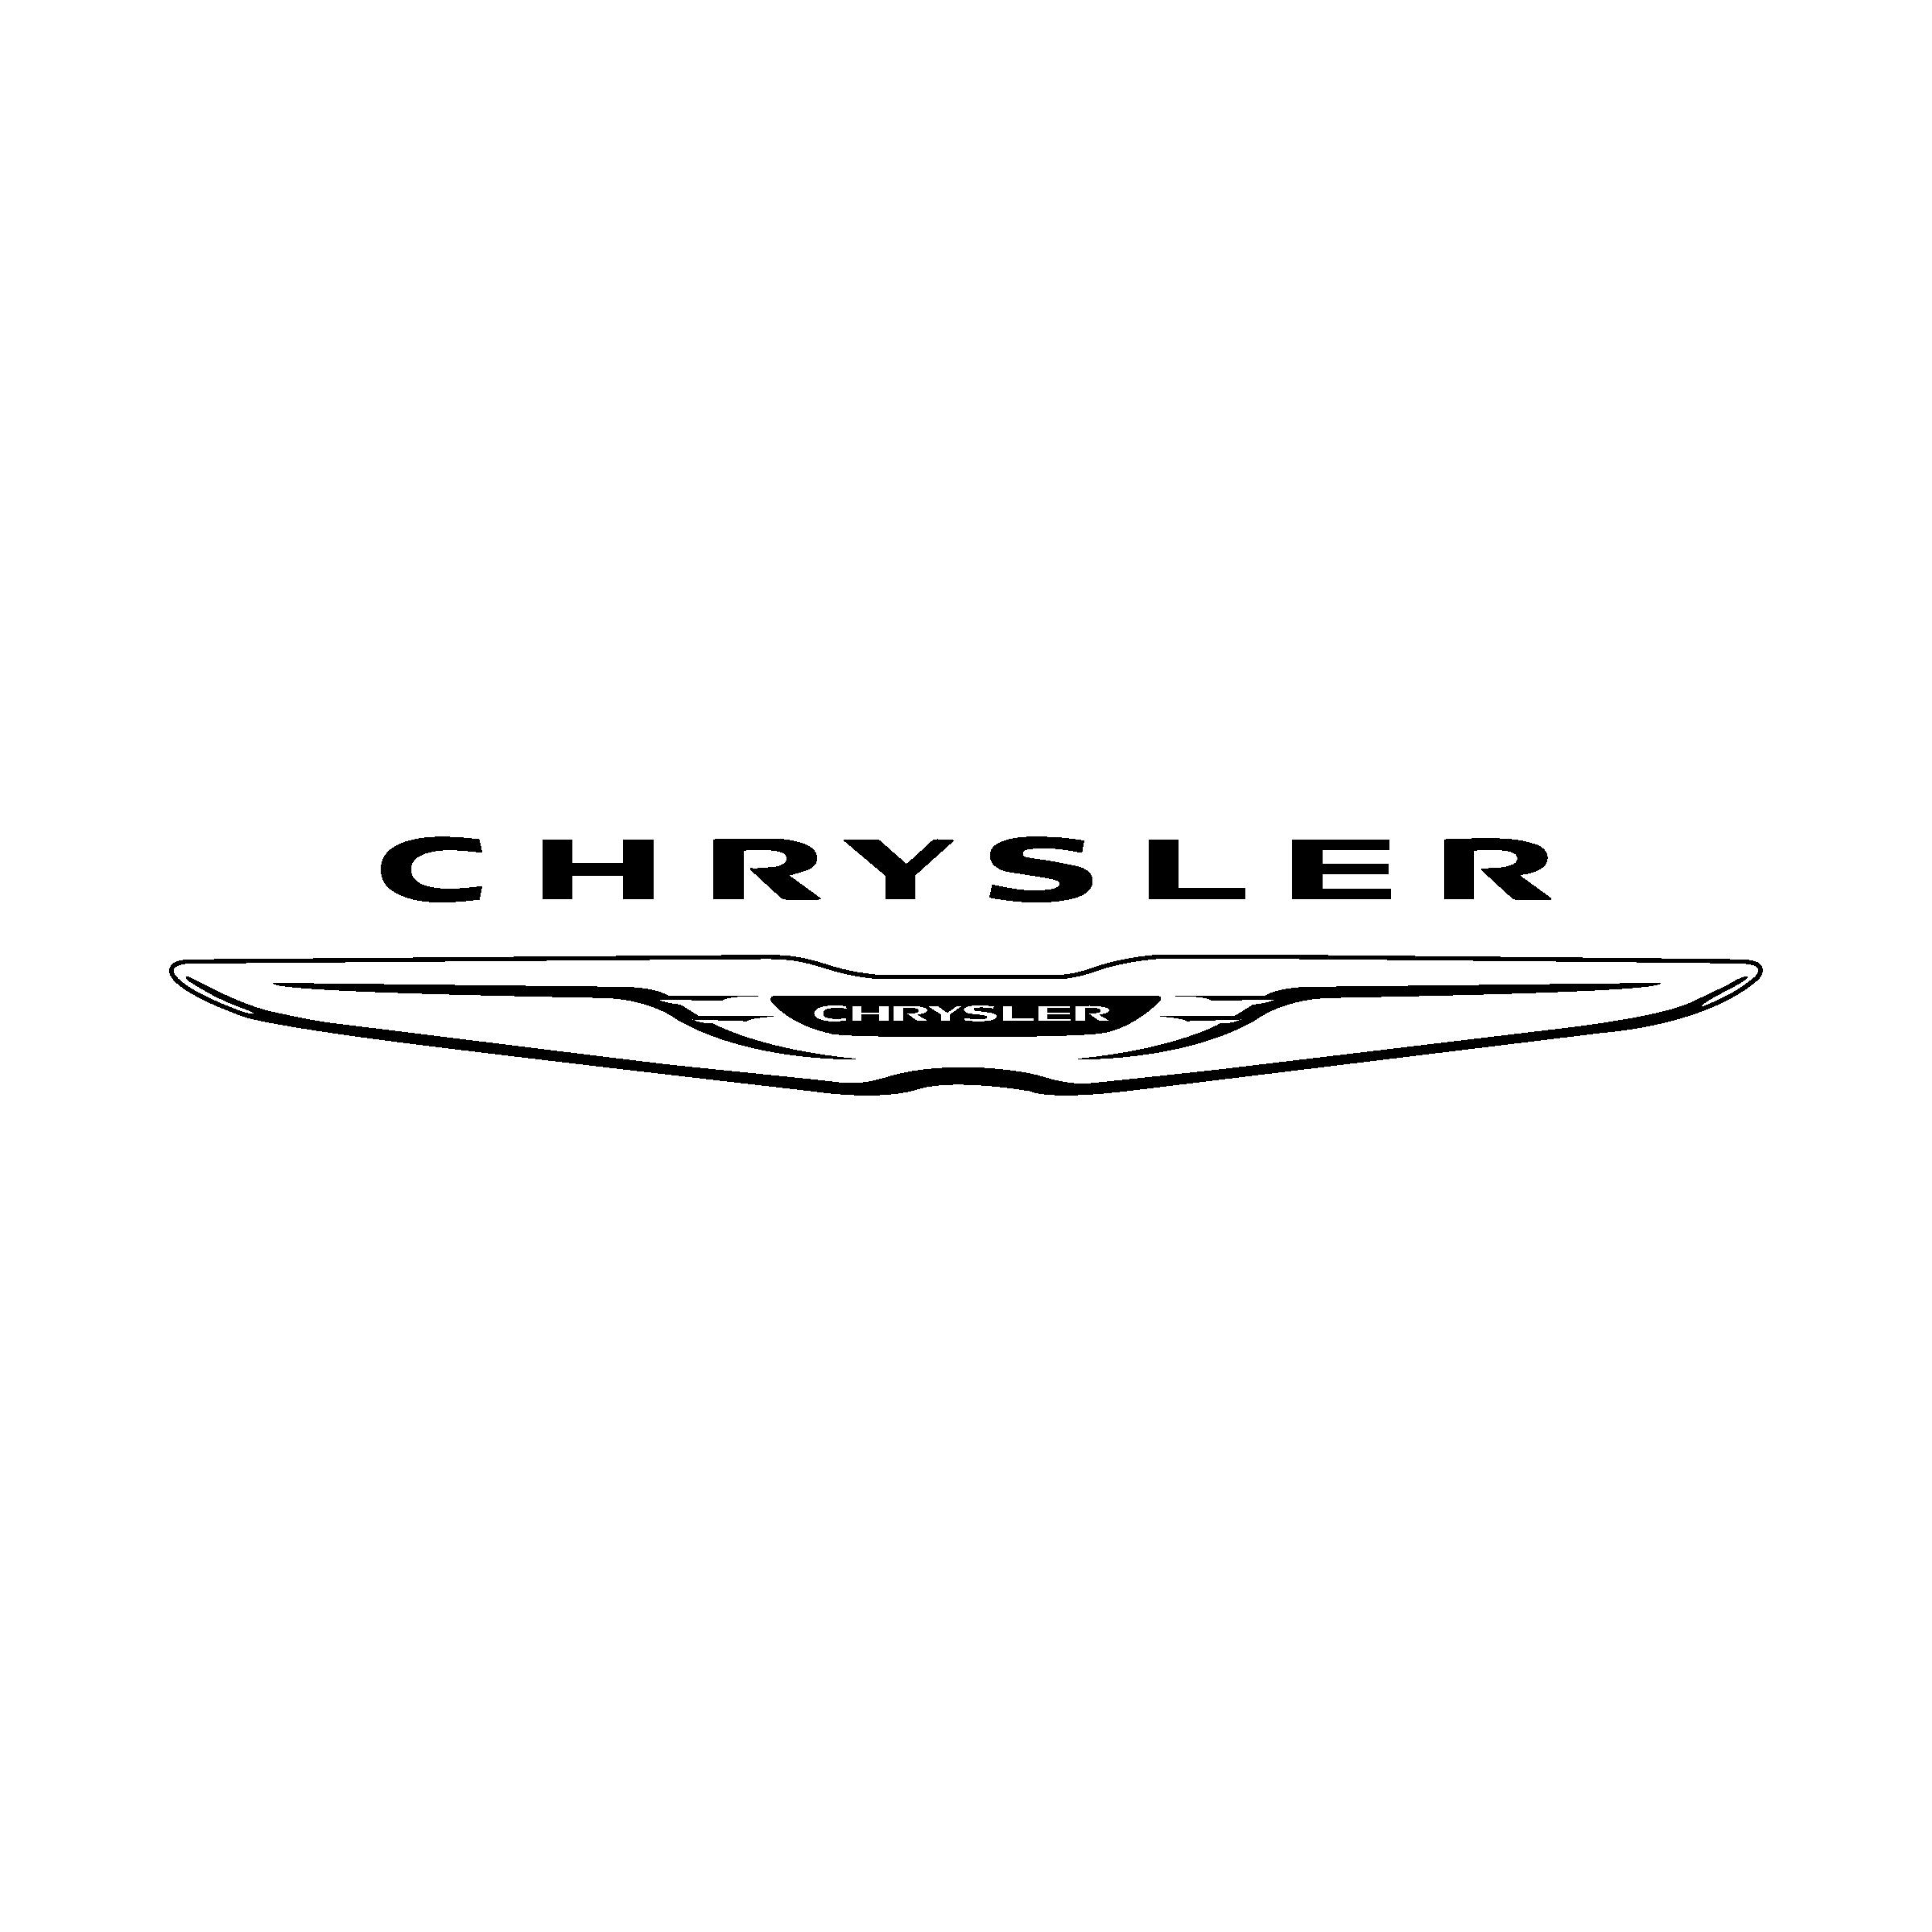 Chrysler-01.png